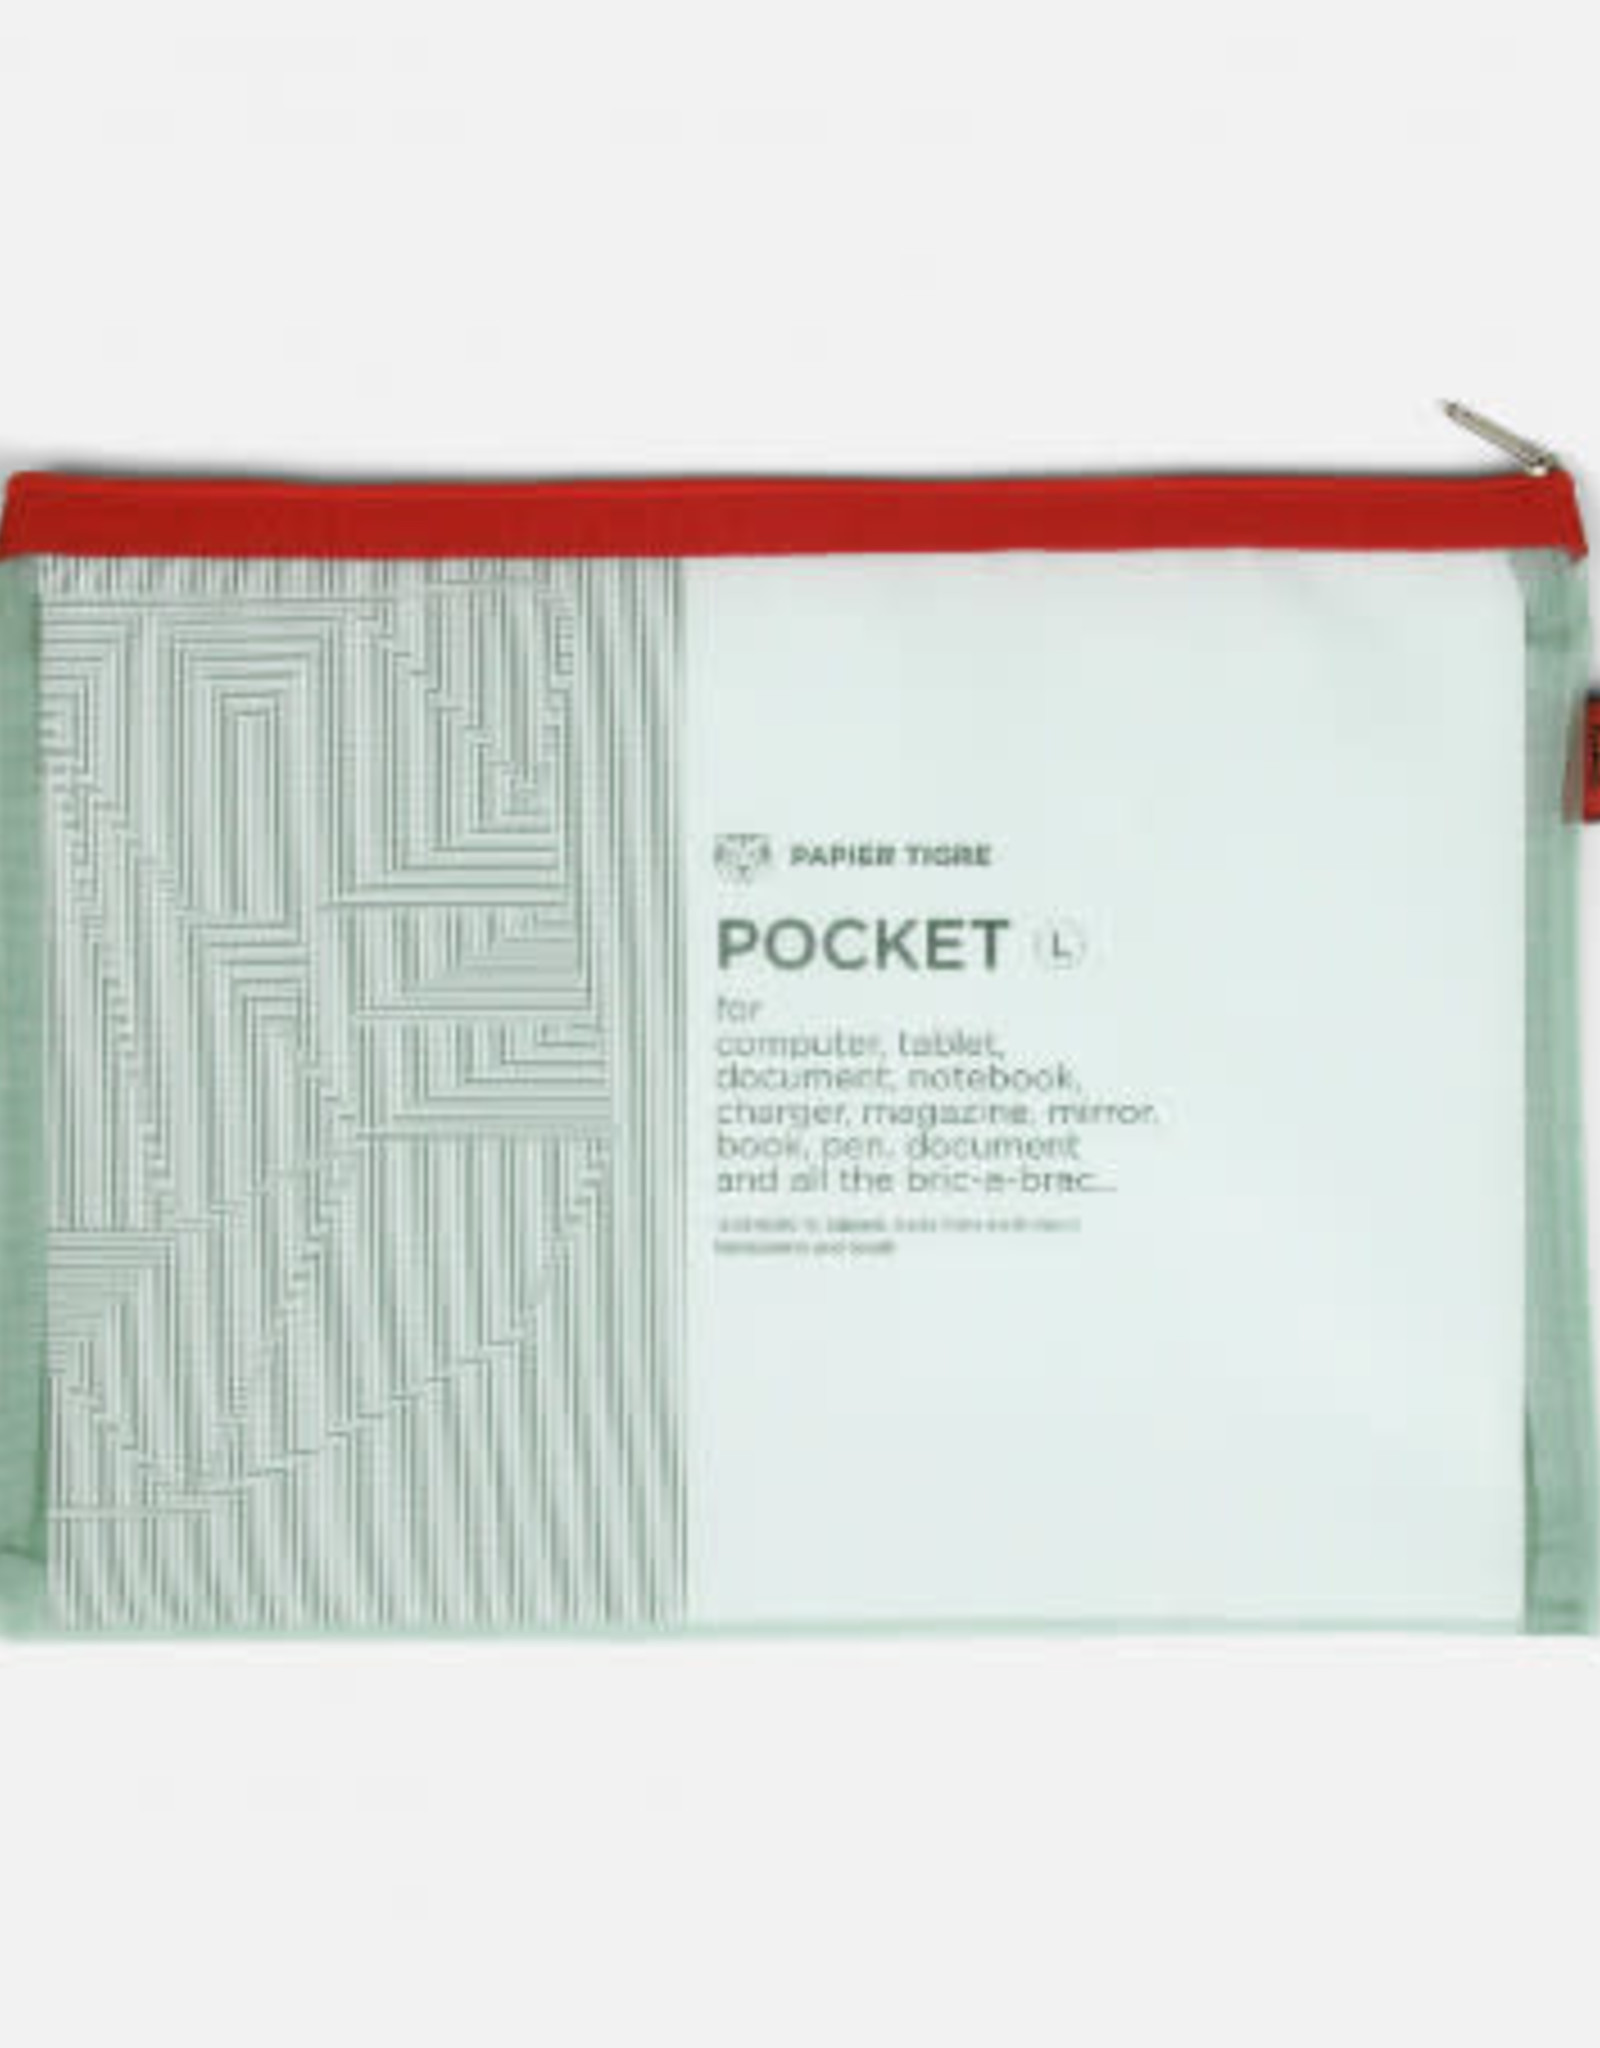 Papier Tigre Papier Tigre Large Mesh Pocket